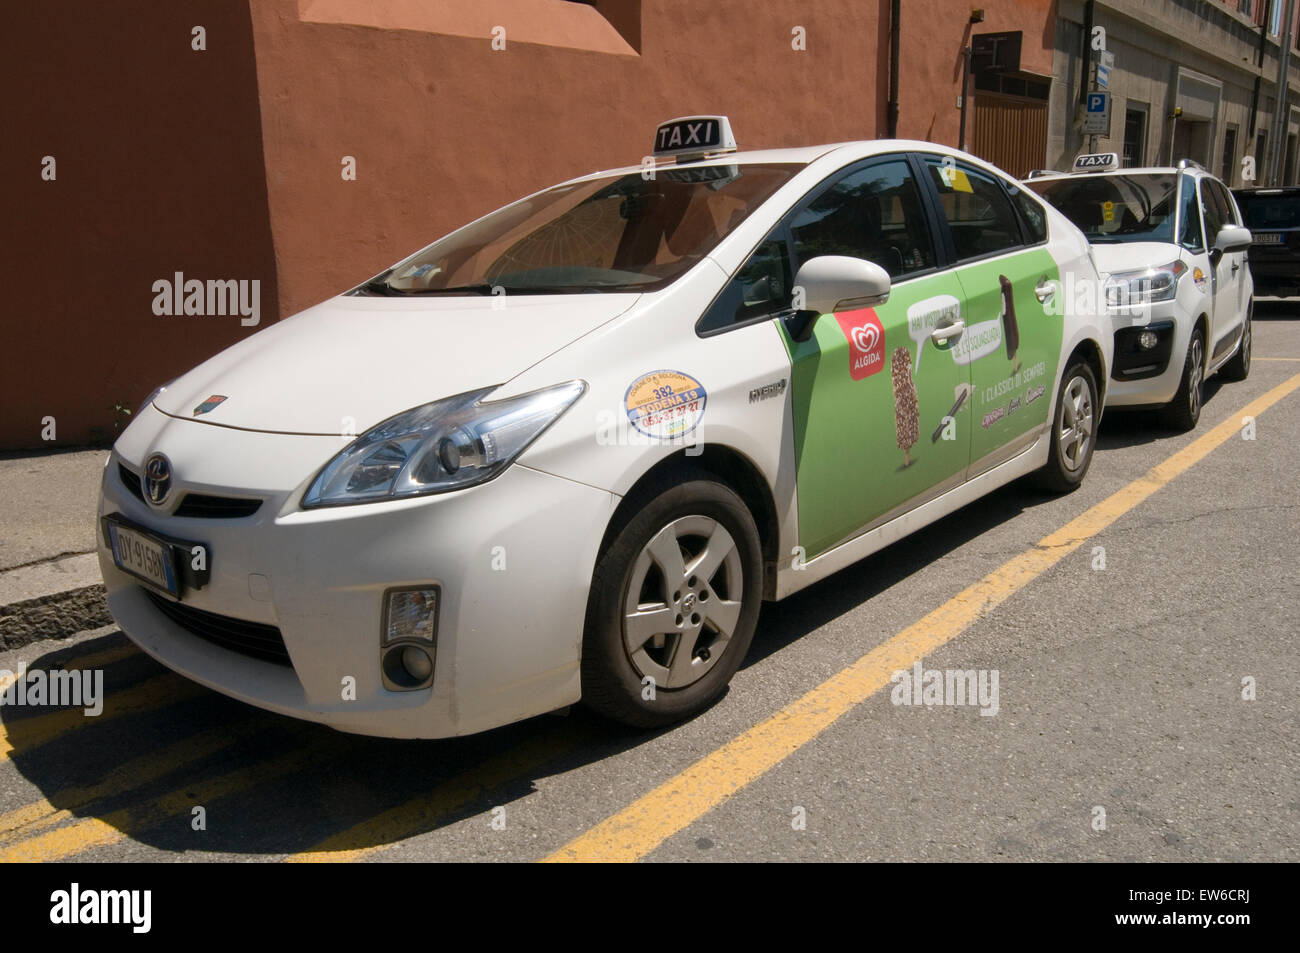 Pirus Prius hybride de Toyota voitures voiture hybred japonais taxi Photo Stock